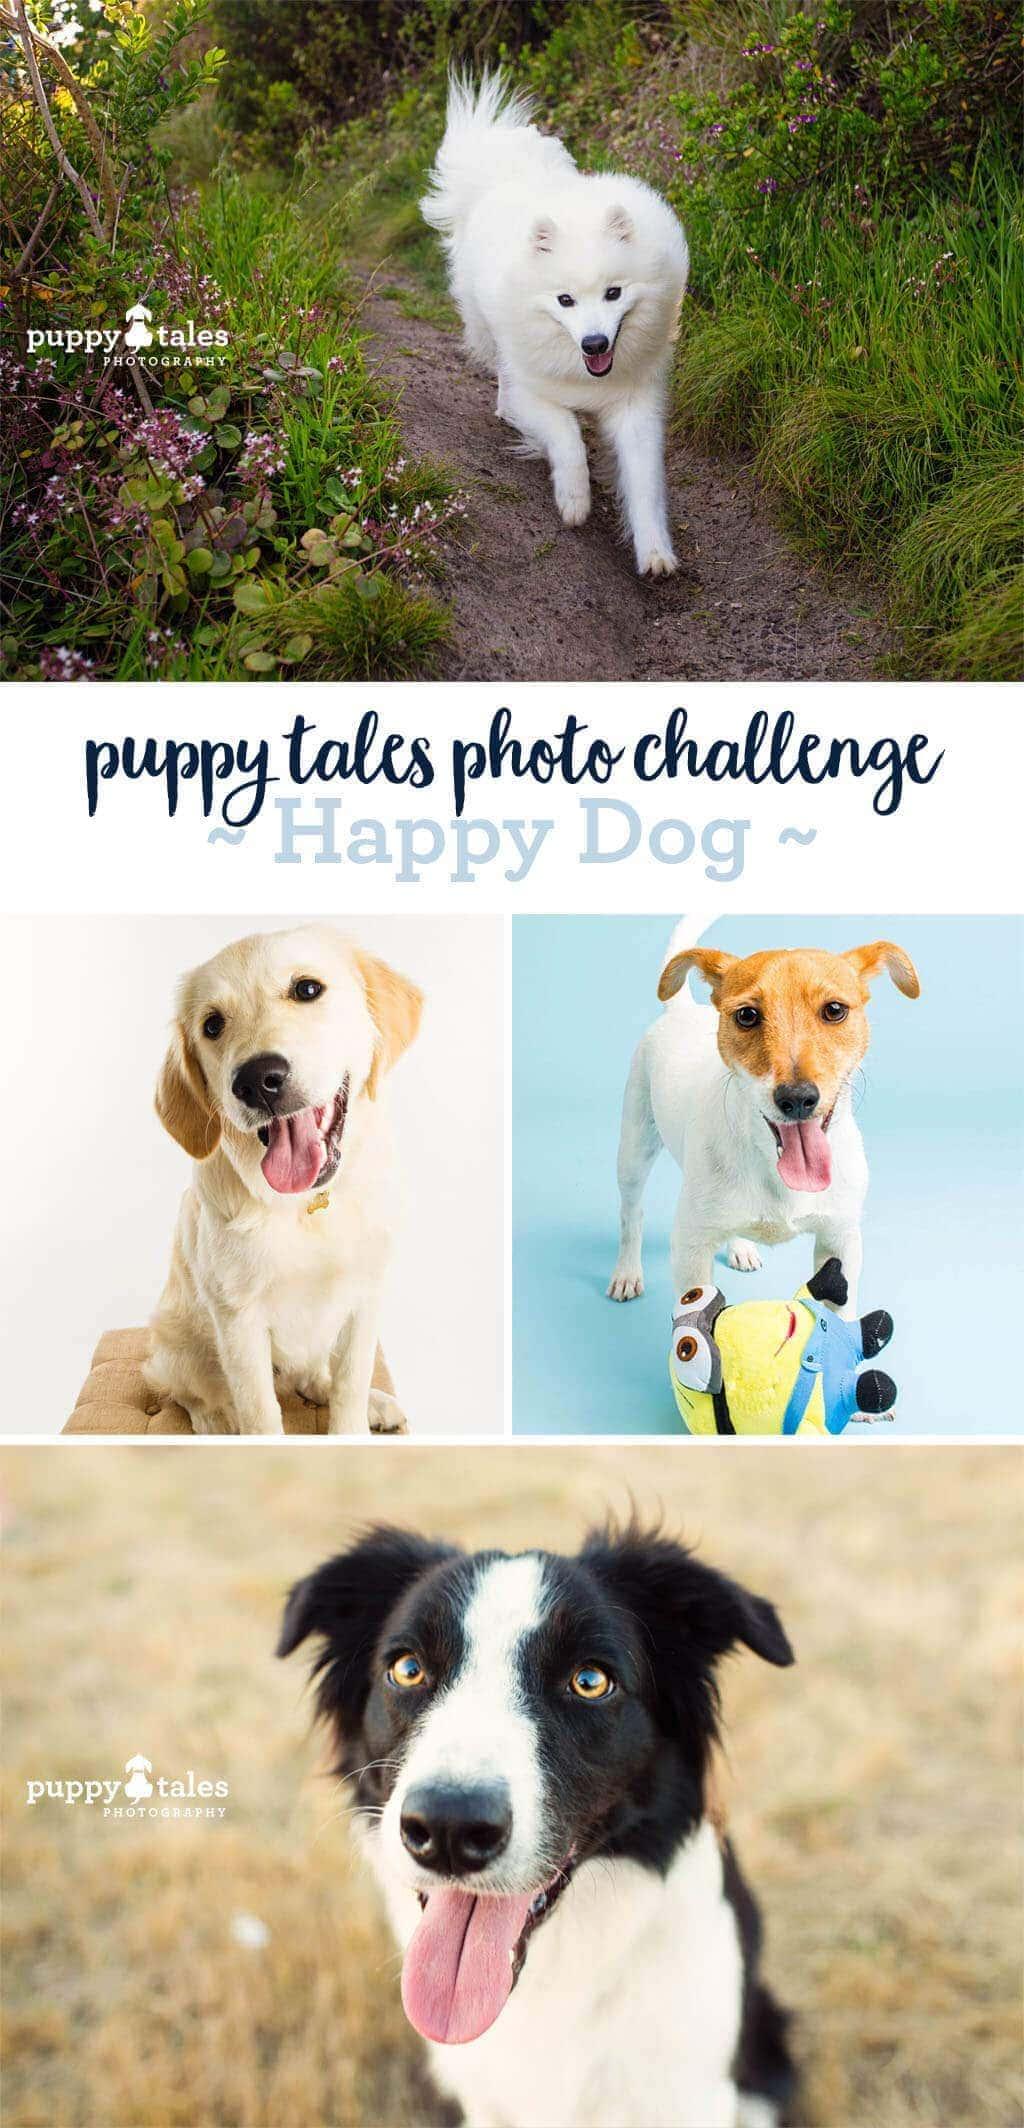 Puppy-Tales-Photo-Challenge-Happy-Dog